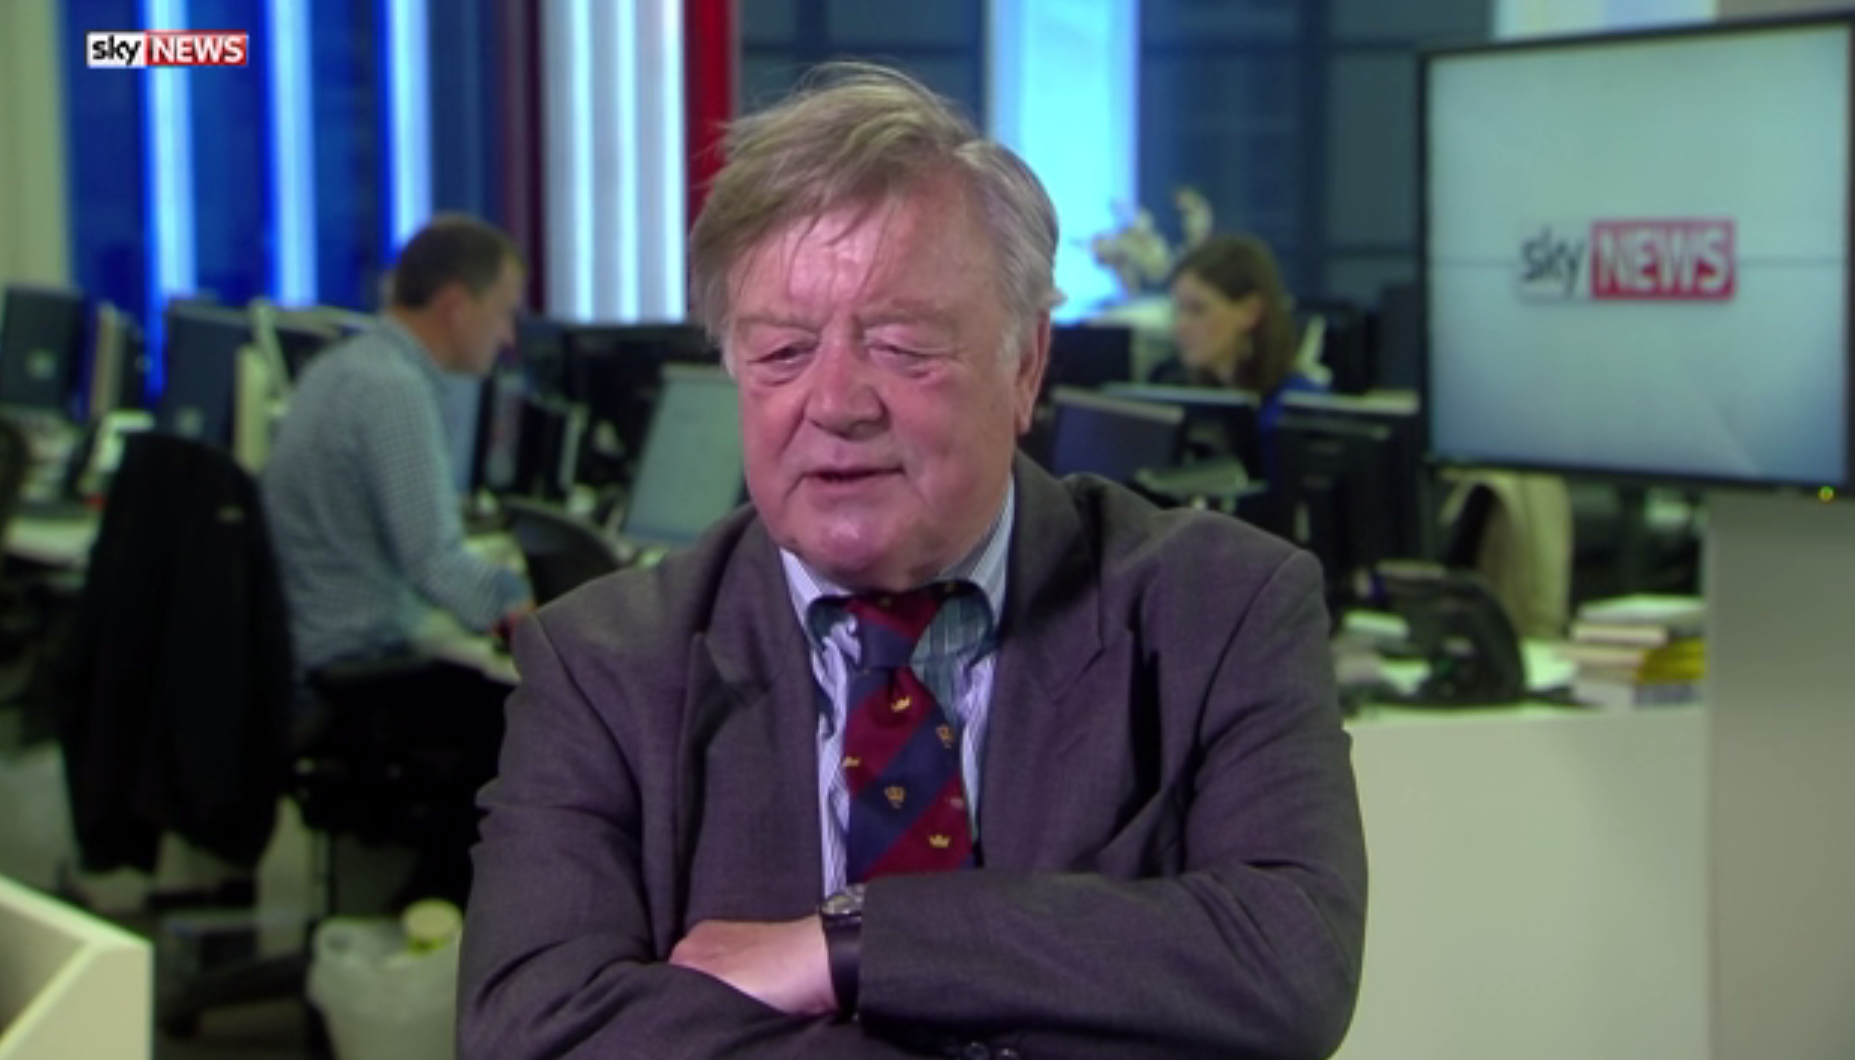 Ken Clarke (via Sky News/YouTube)